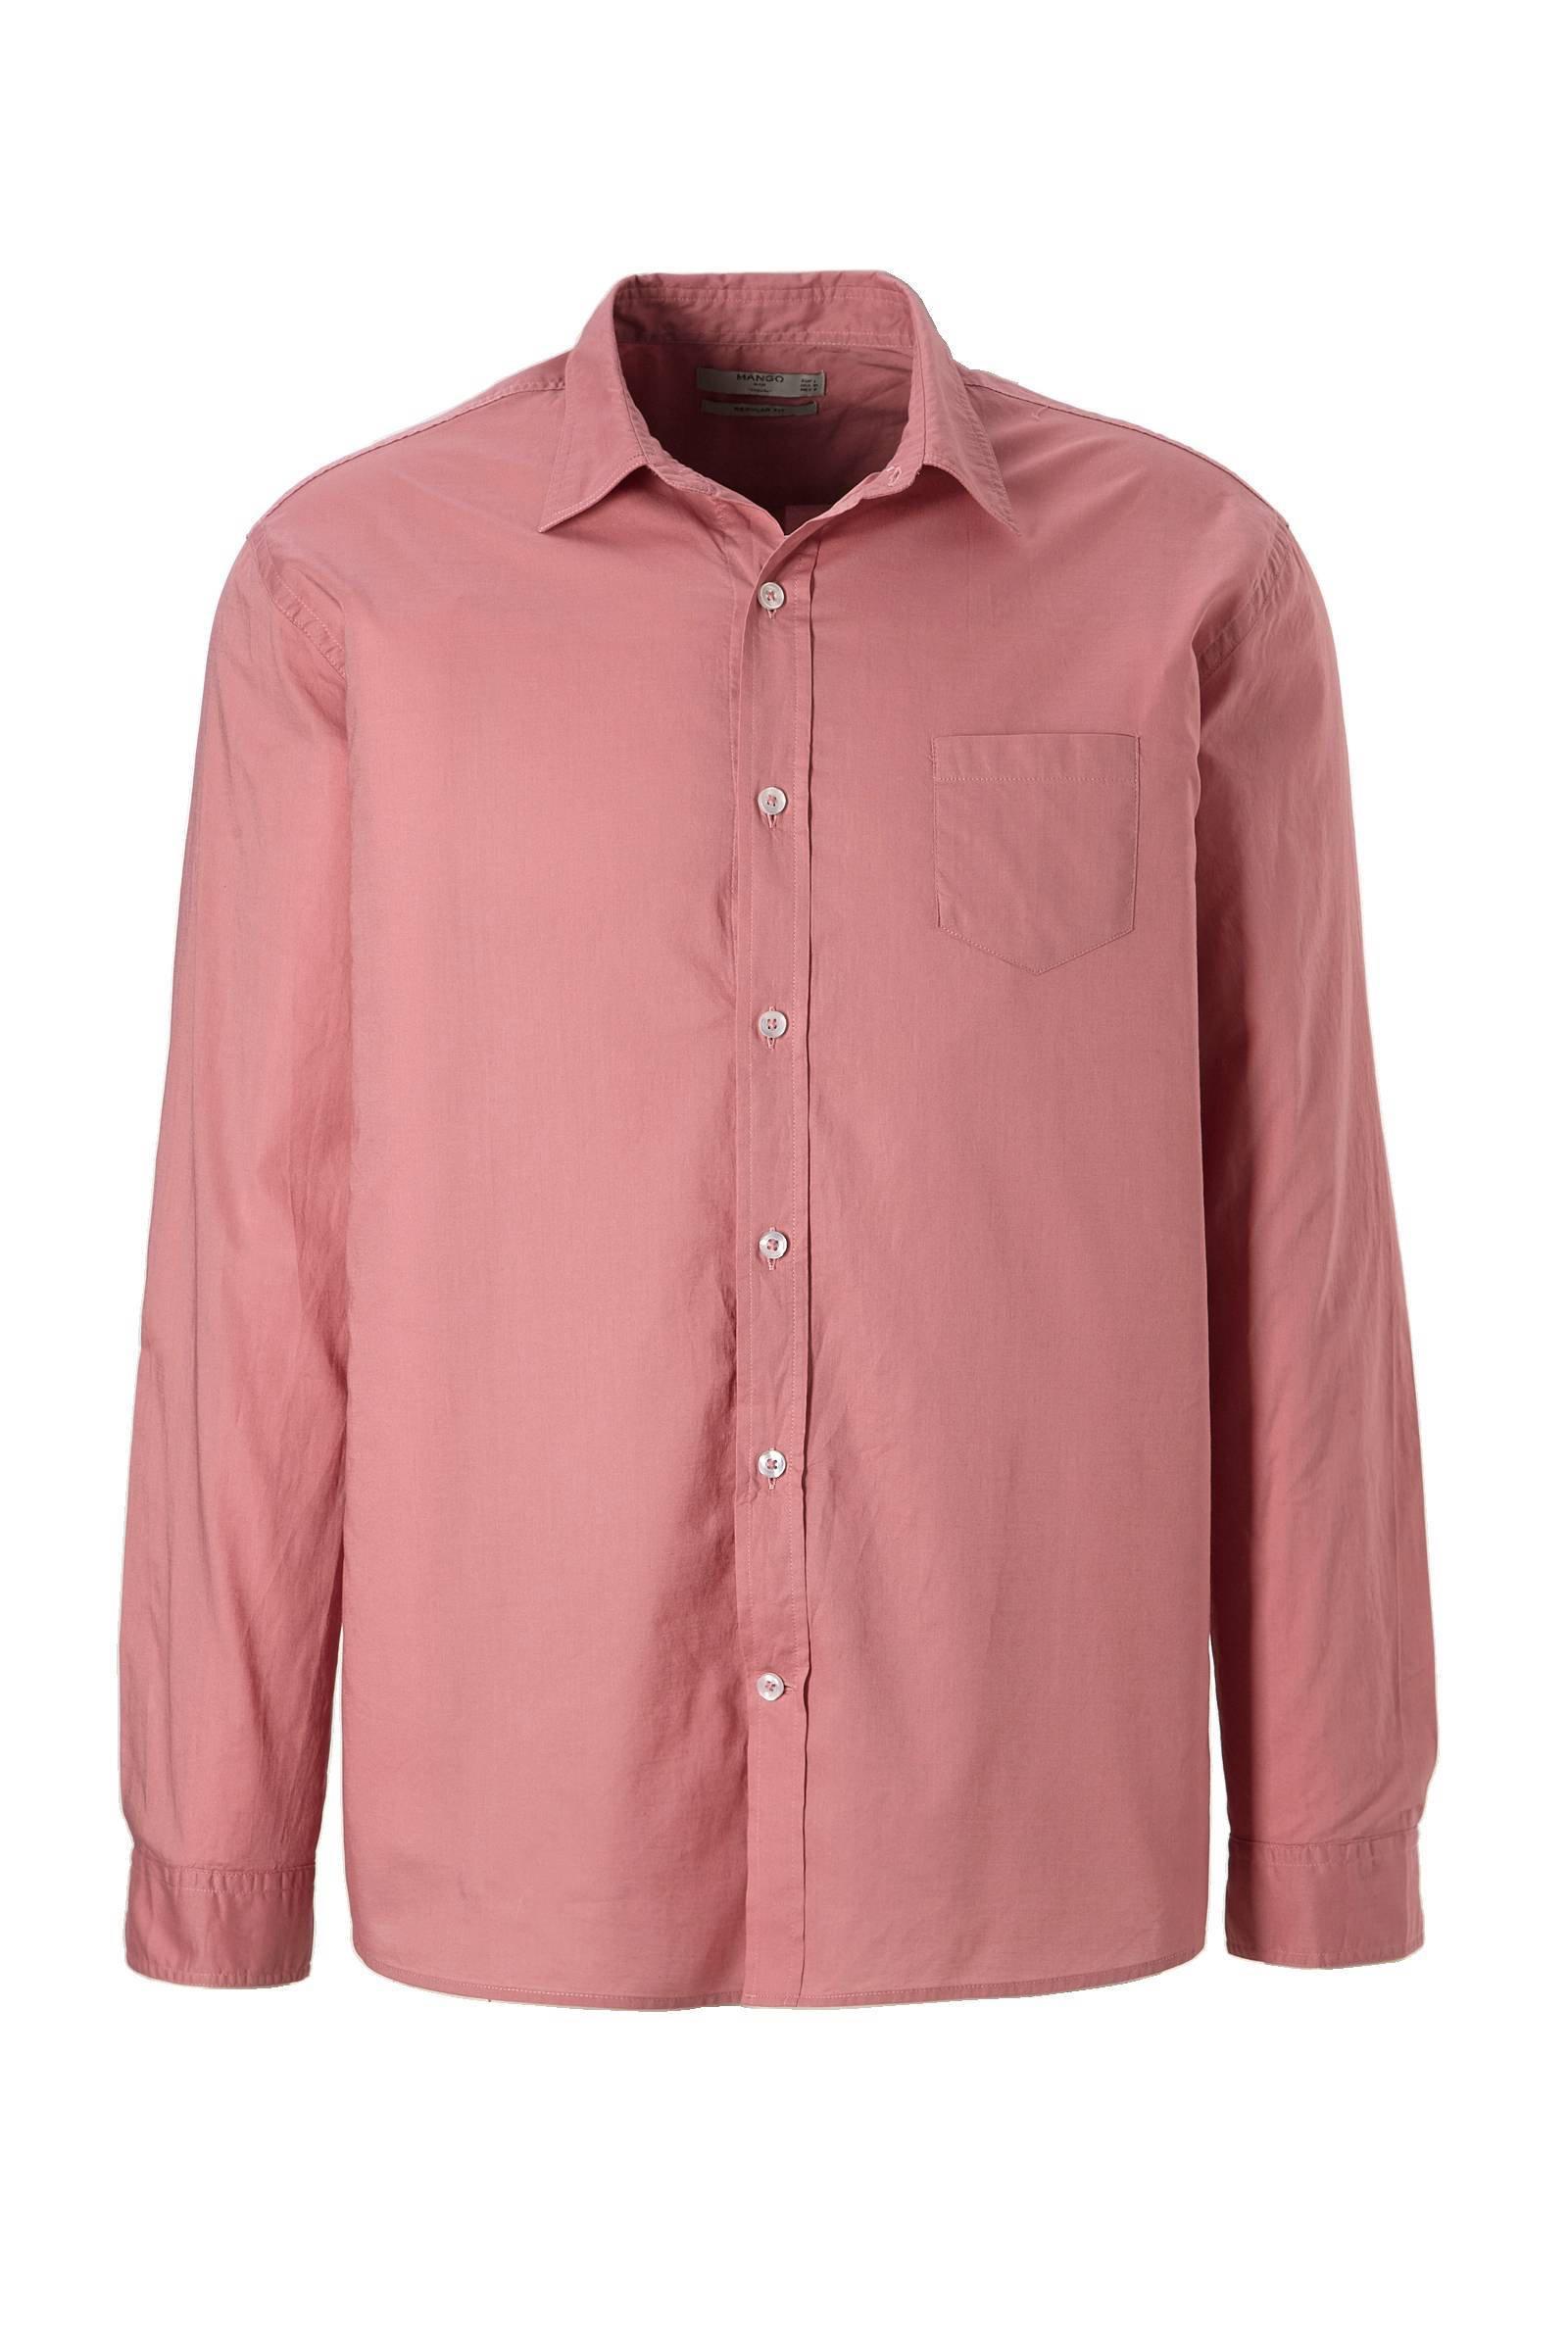 Heren Overhemd Roze.Mango Man Regular Fit Overhemd Roze Wehkamp